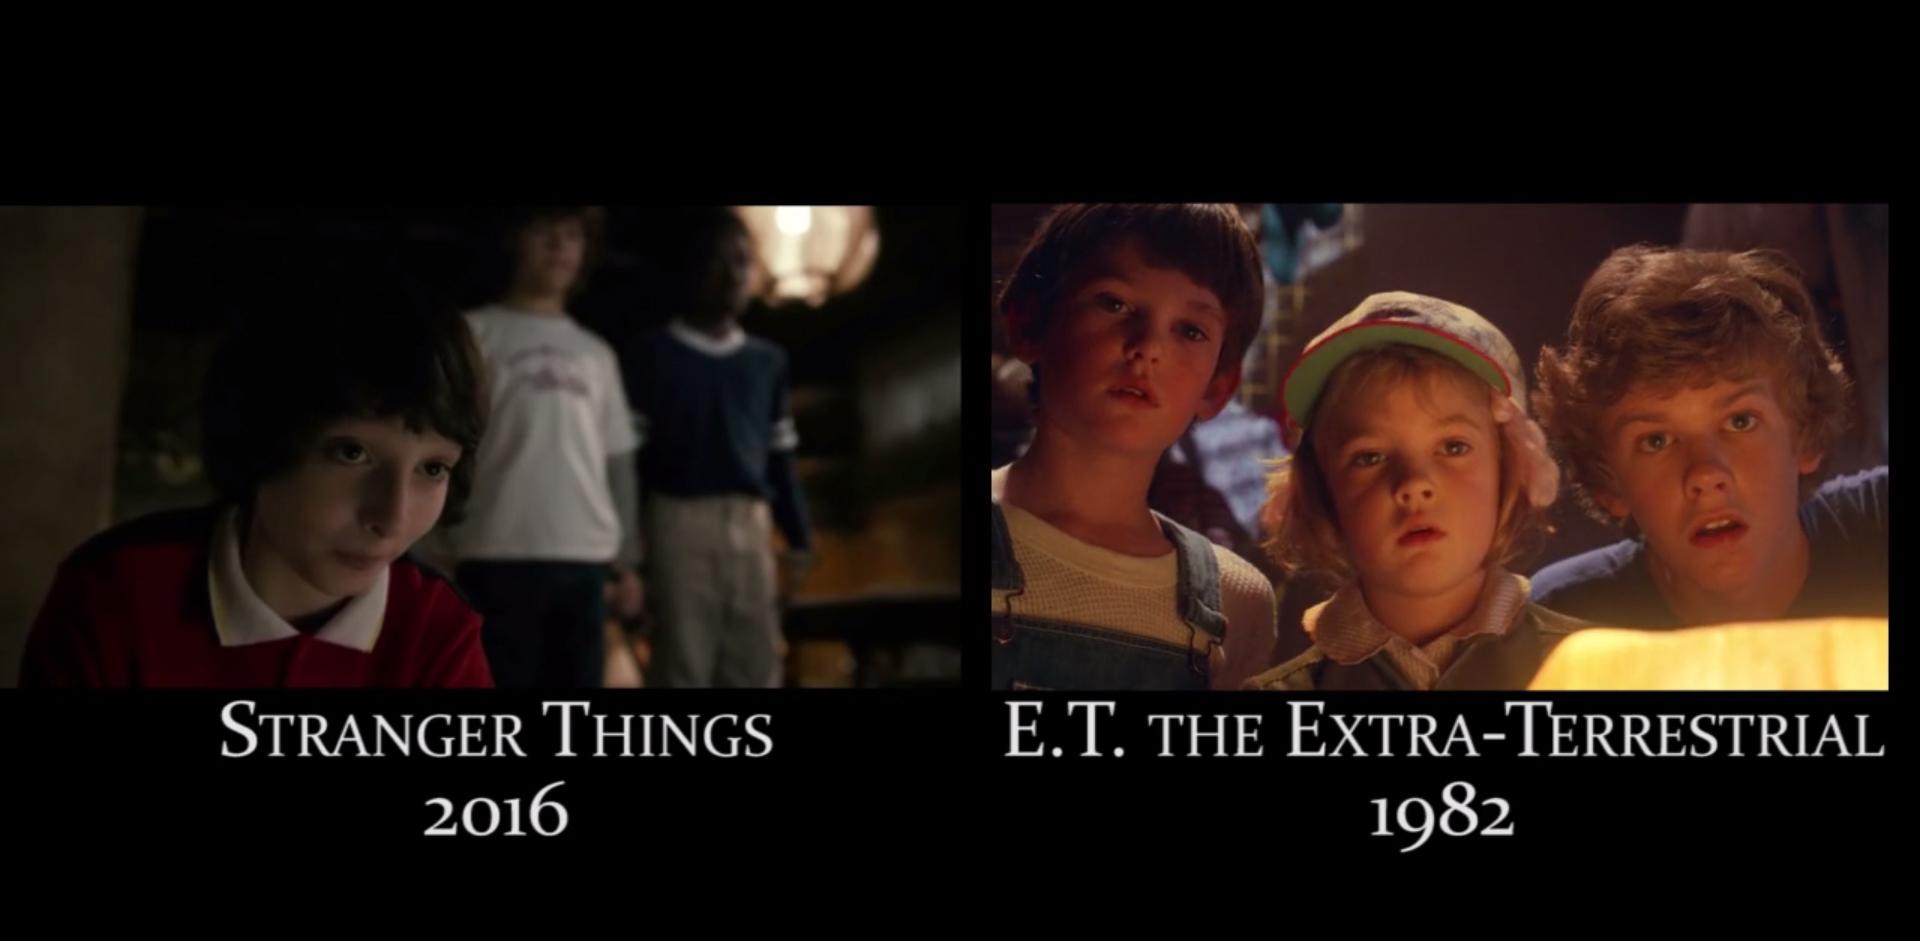 Stranger Things, i riferimenti ai film '70-'80